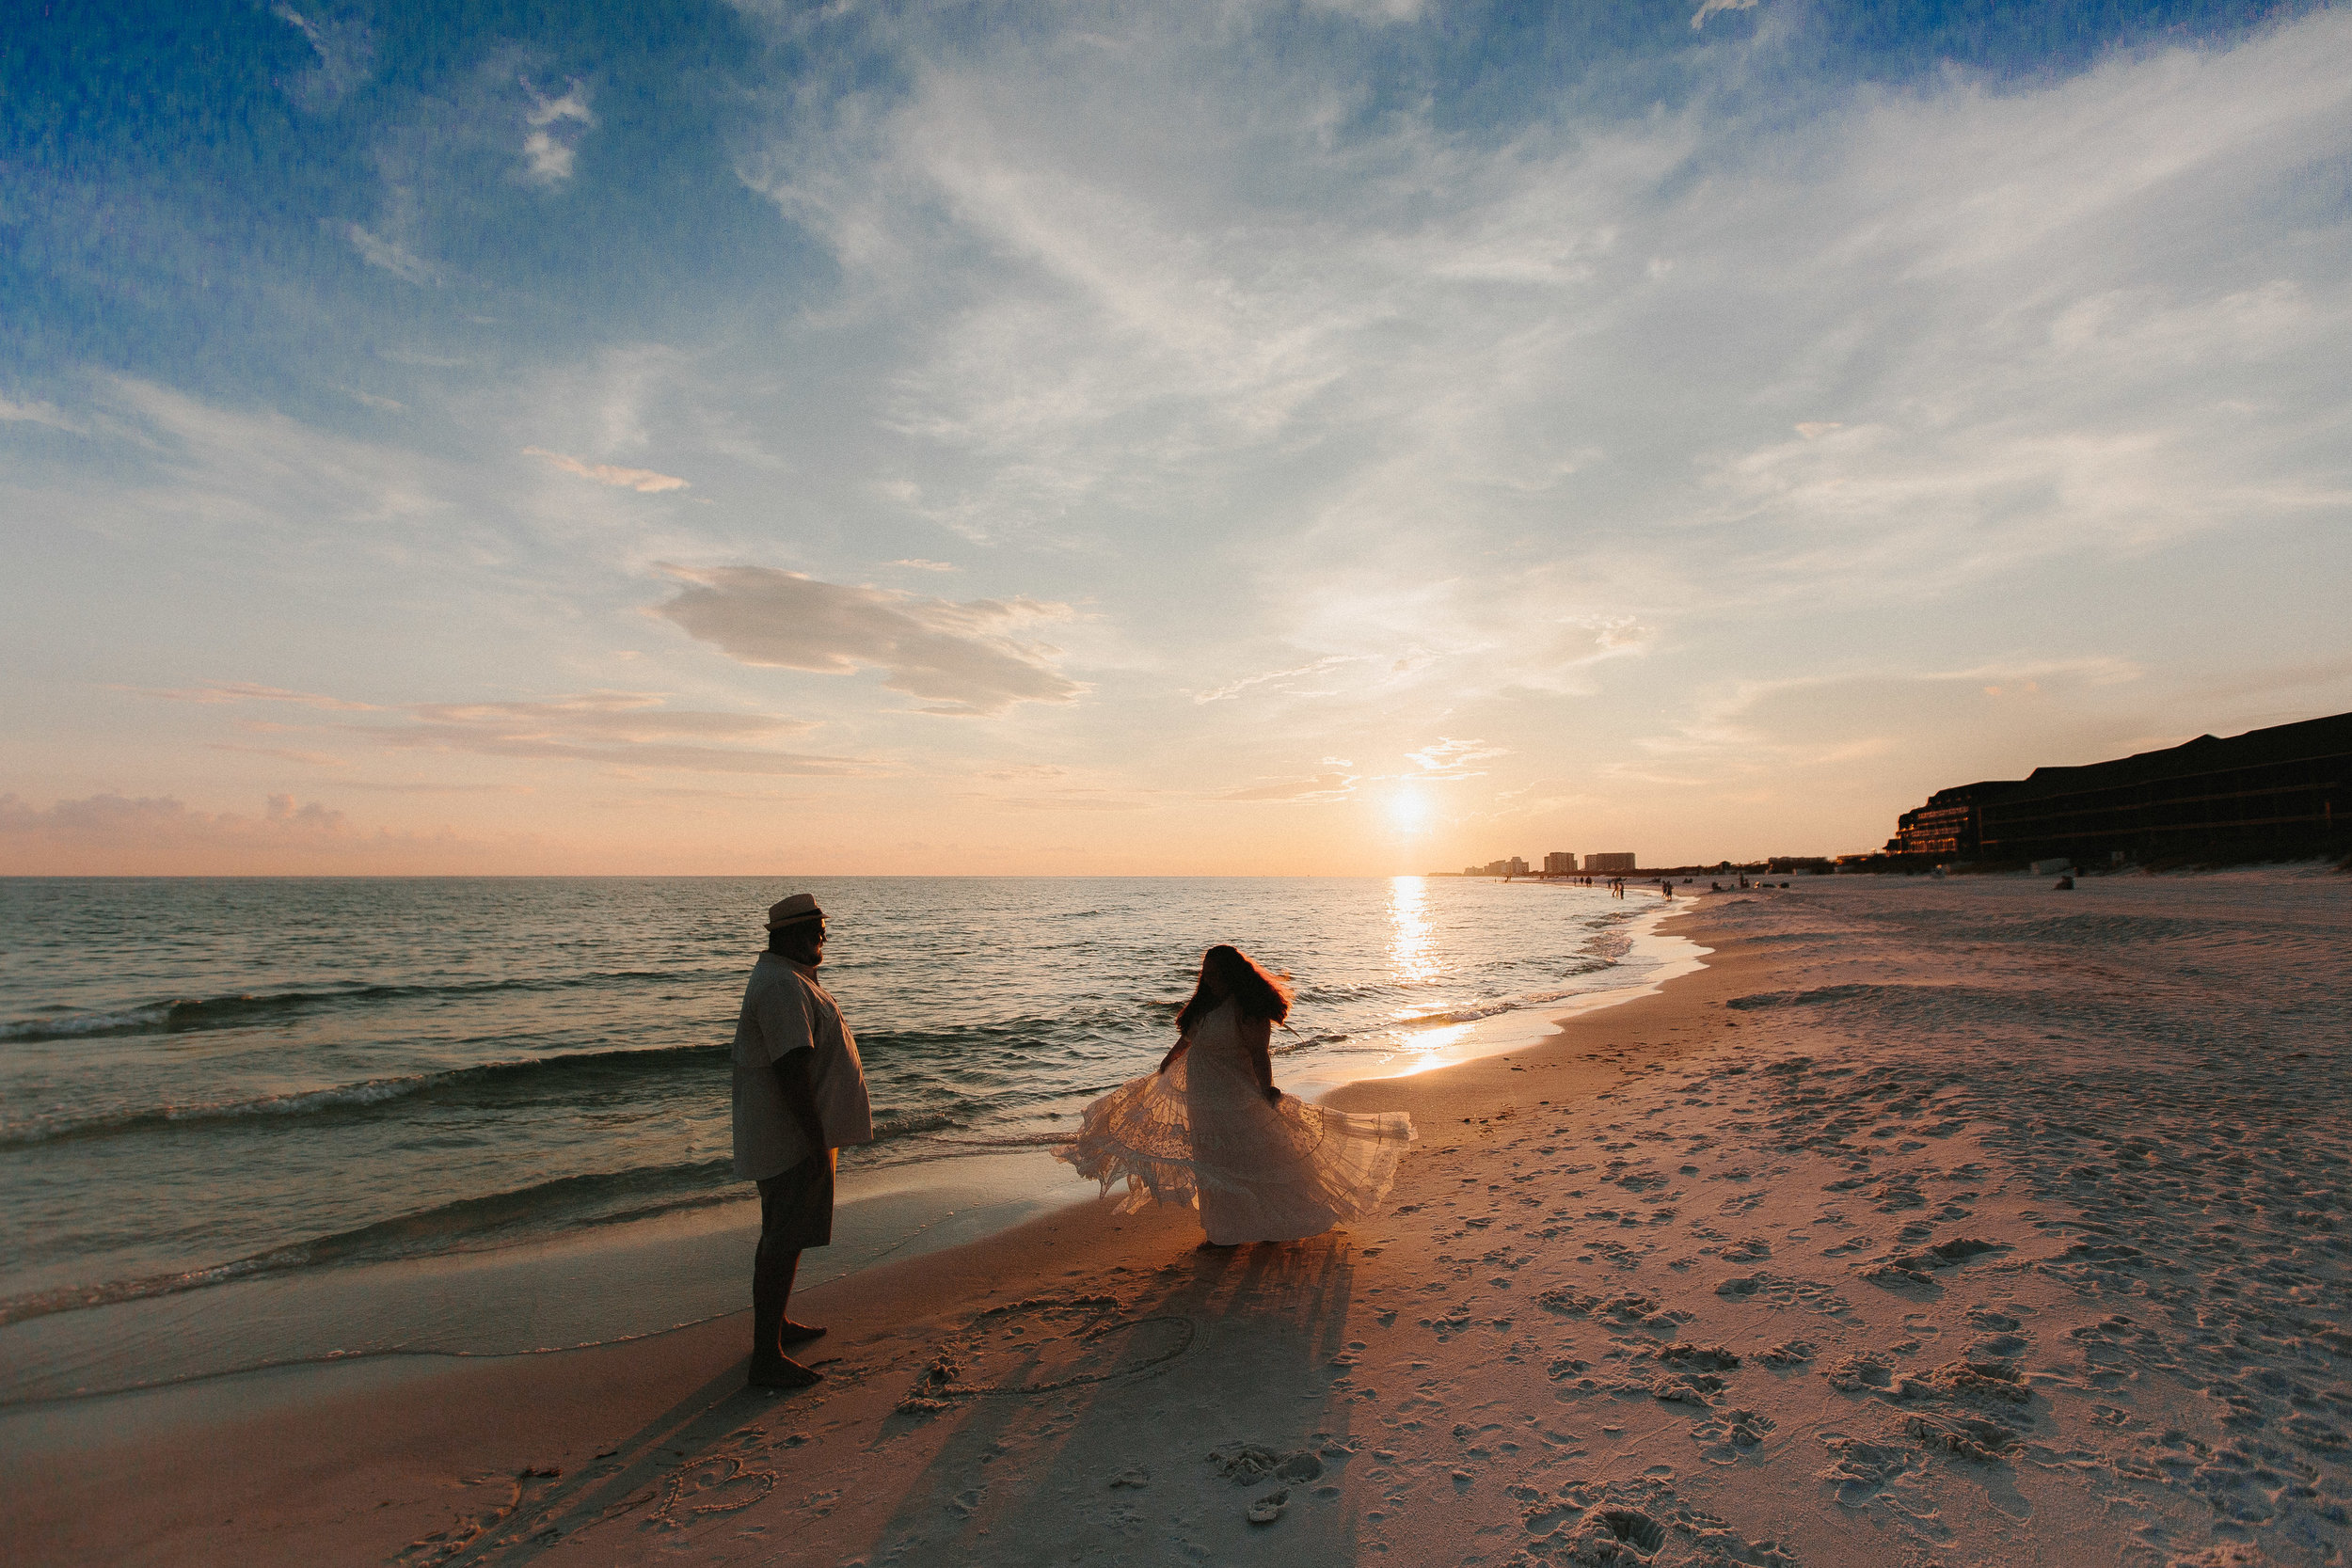 destin_sunset_beach_elopement_intimate_wedding_photographer_florida_documentary_1281.jpg